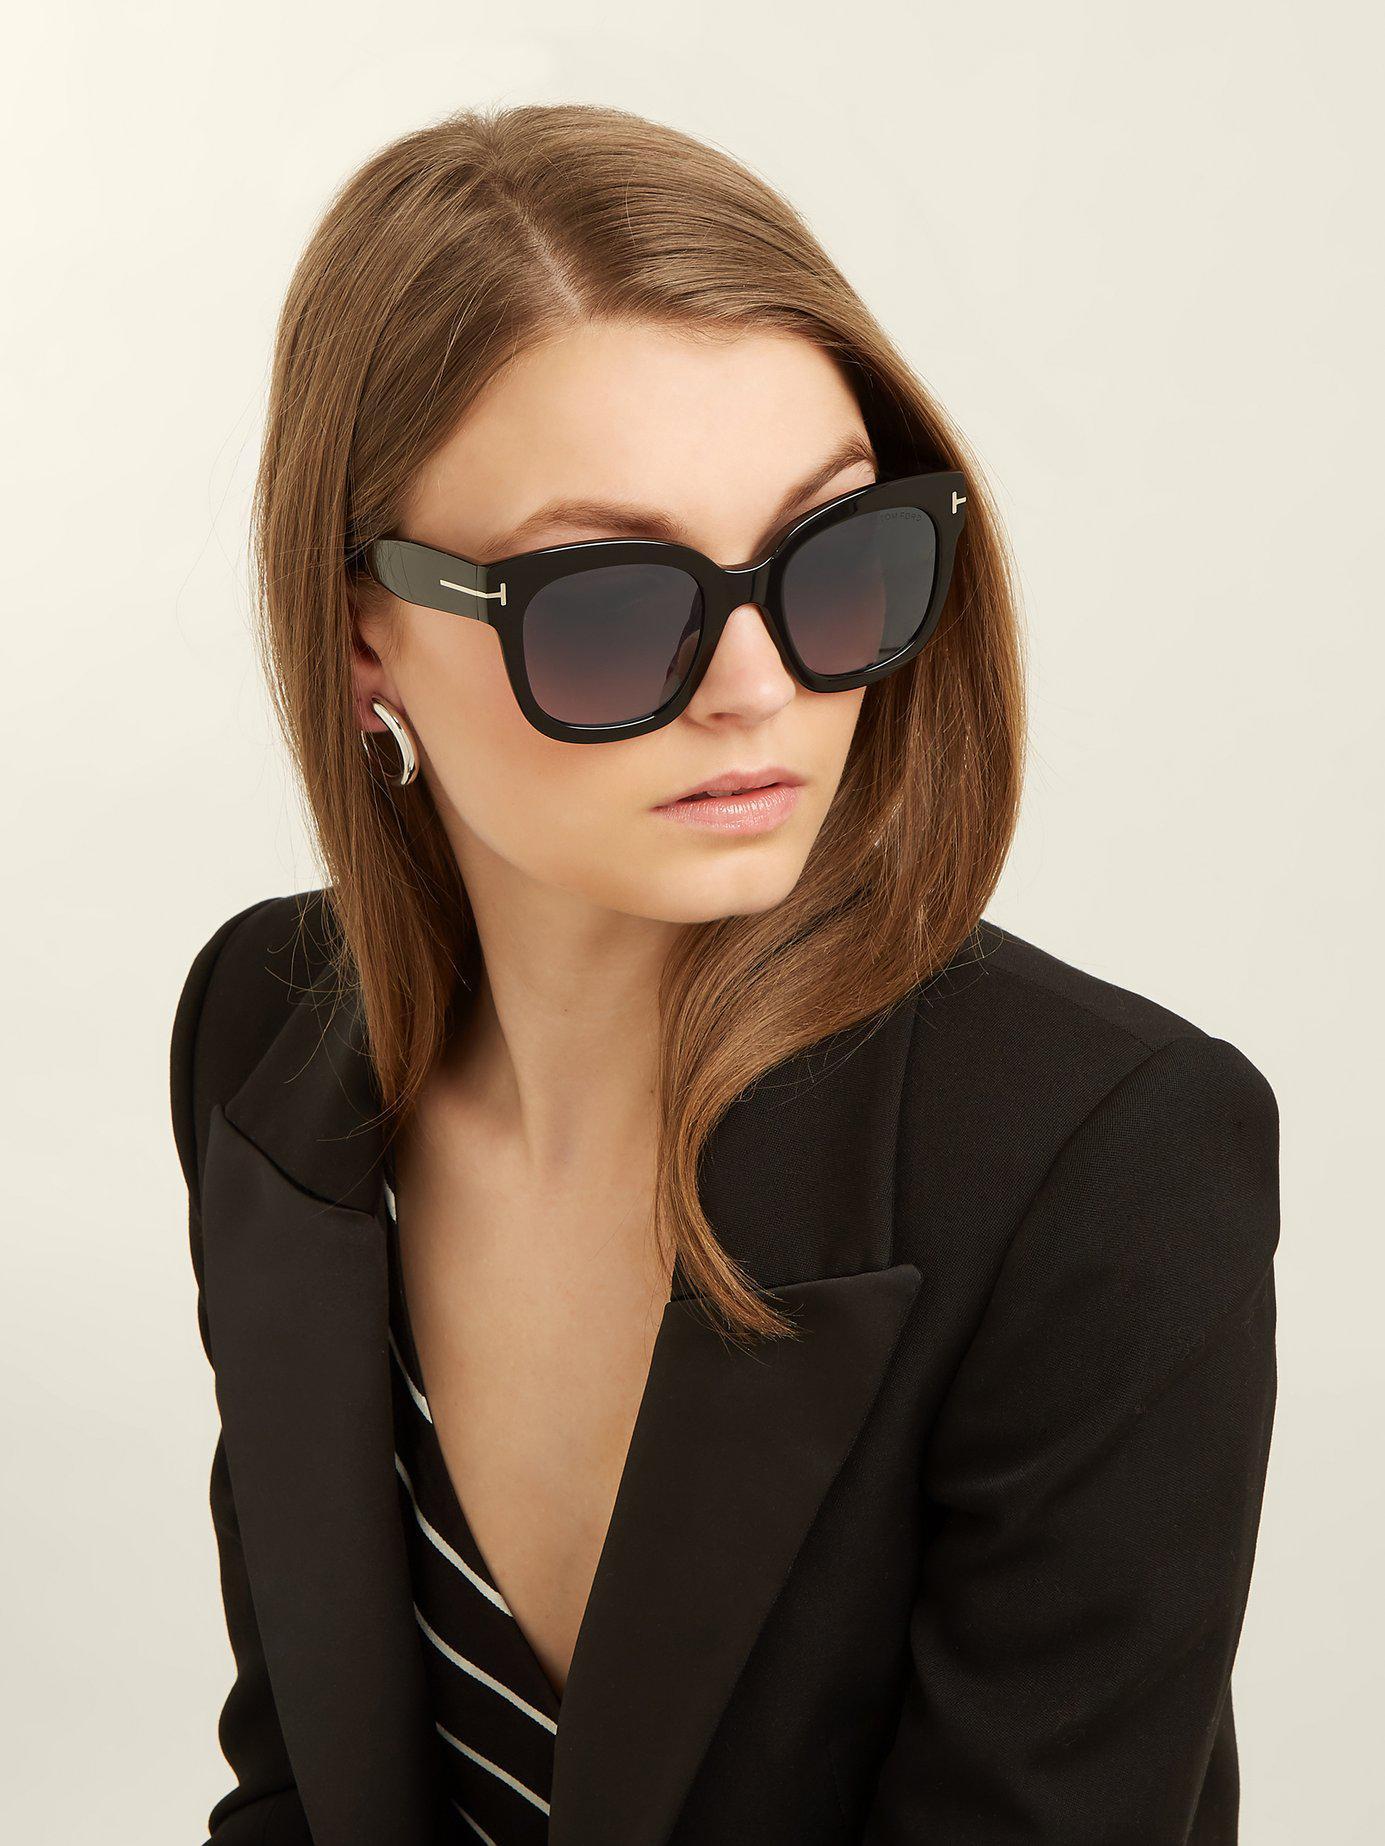 d80e9928fd Lyst - Tom Ford Beatrix Square Frame Sunglasses in Black